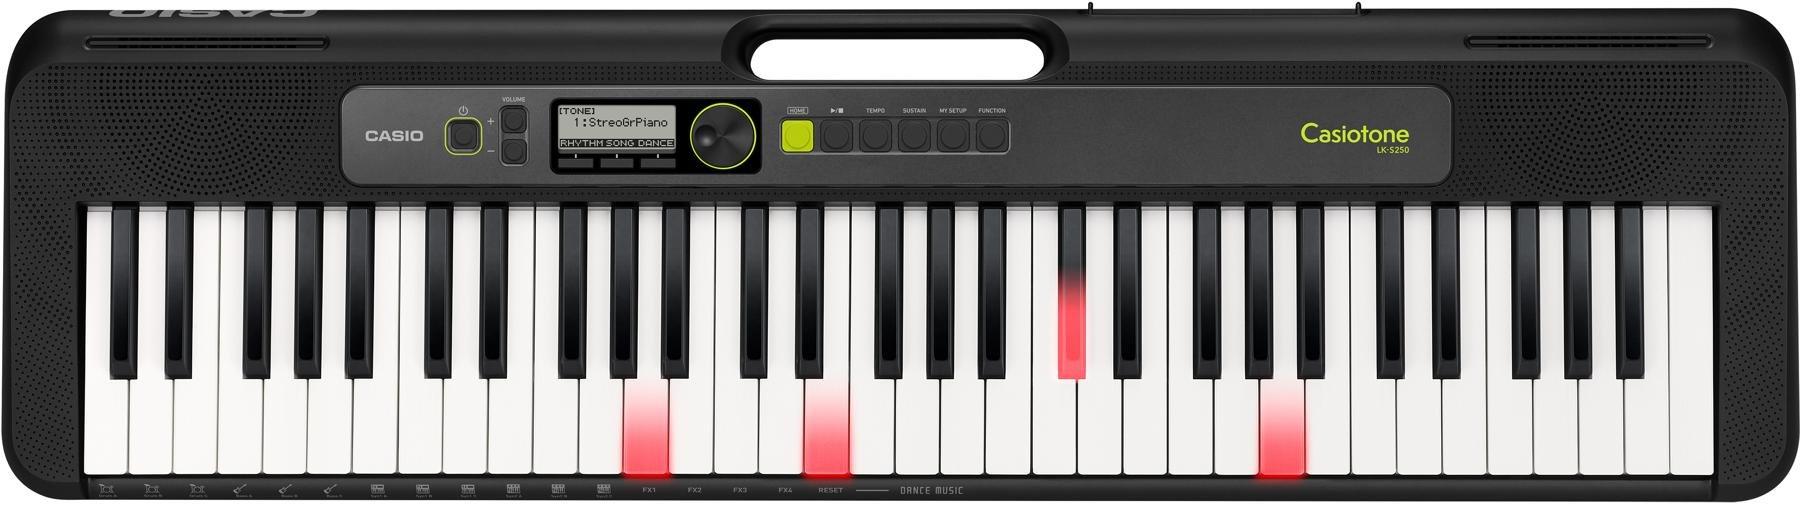 Casio LK-S250 Electronic Keyboard